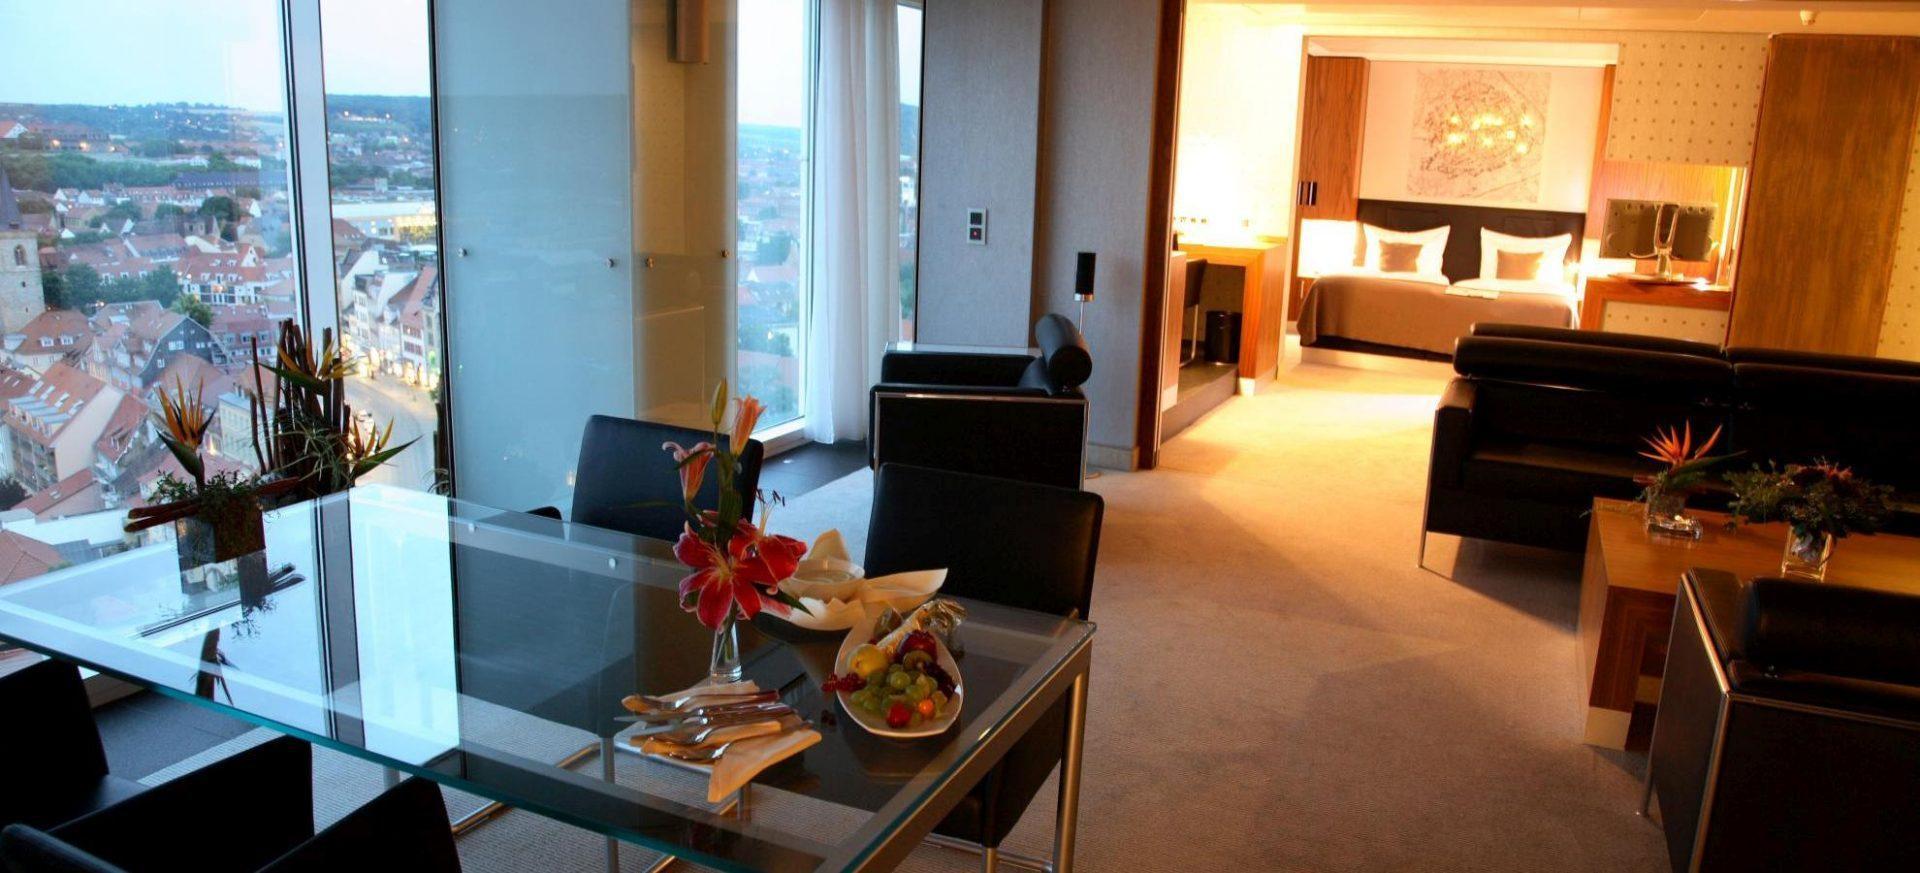 Radisson Blu Hotel Erfurt Präsidenten Suite / Presidential Suite